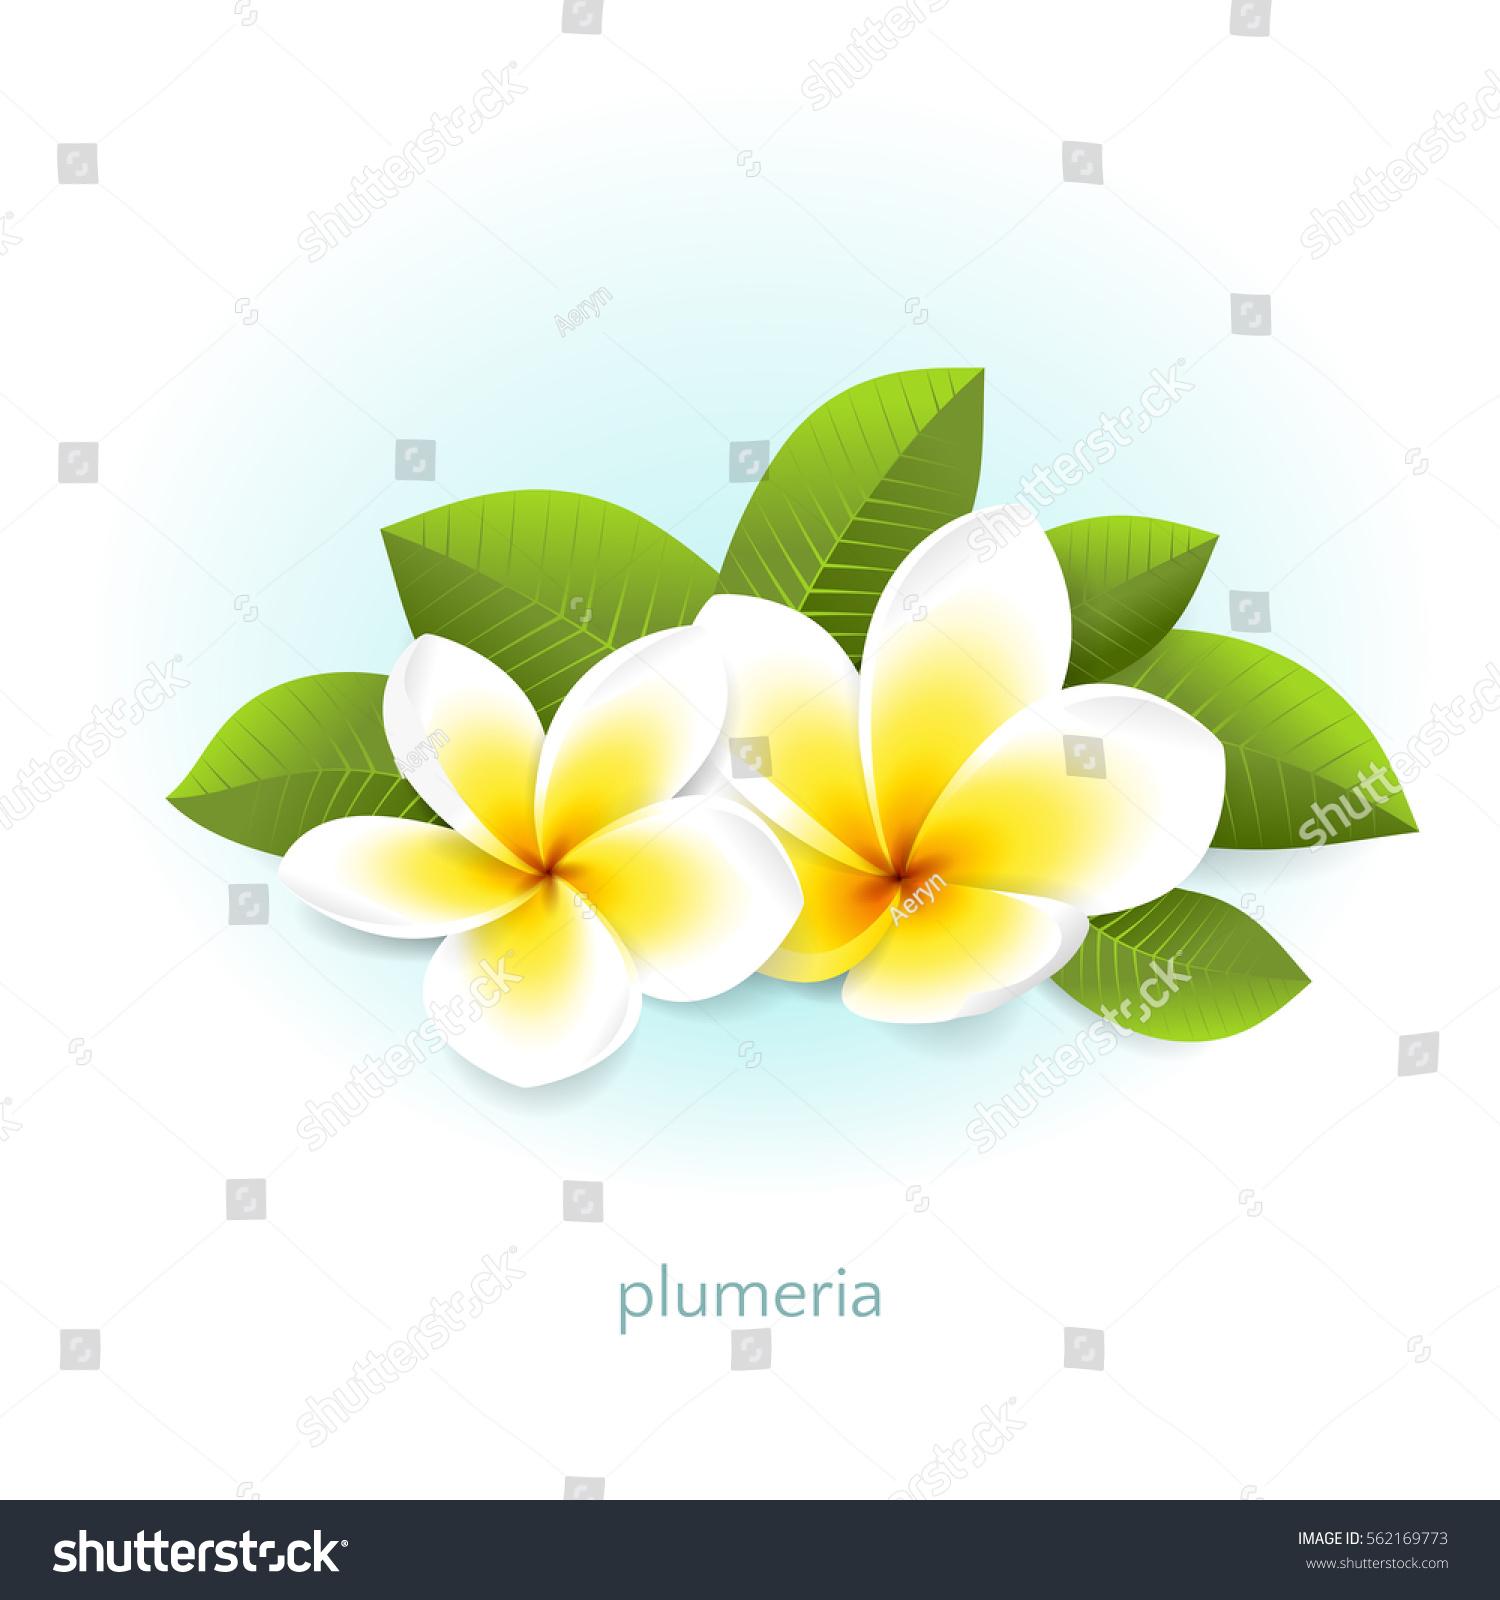 Vector Realistic Plumeria Leaves White Tropical Stock Vector